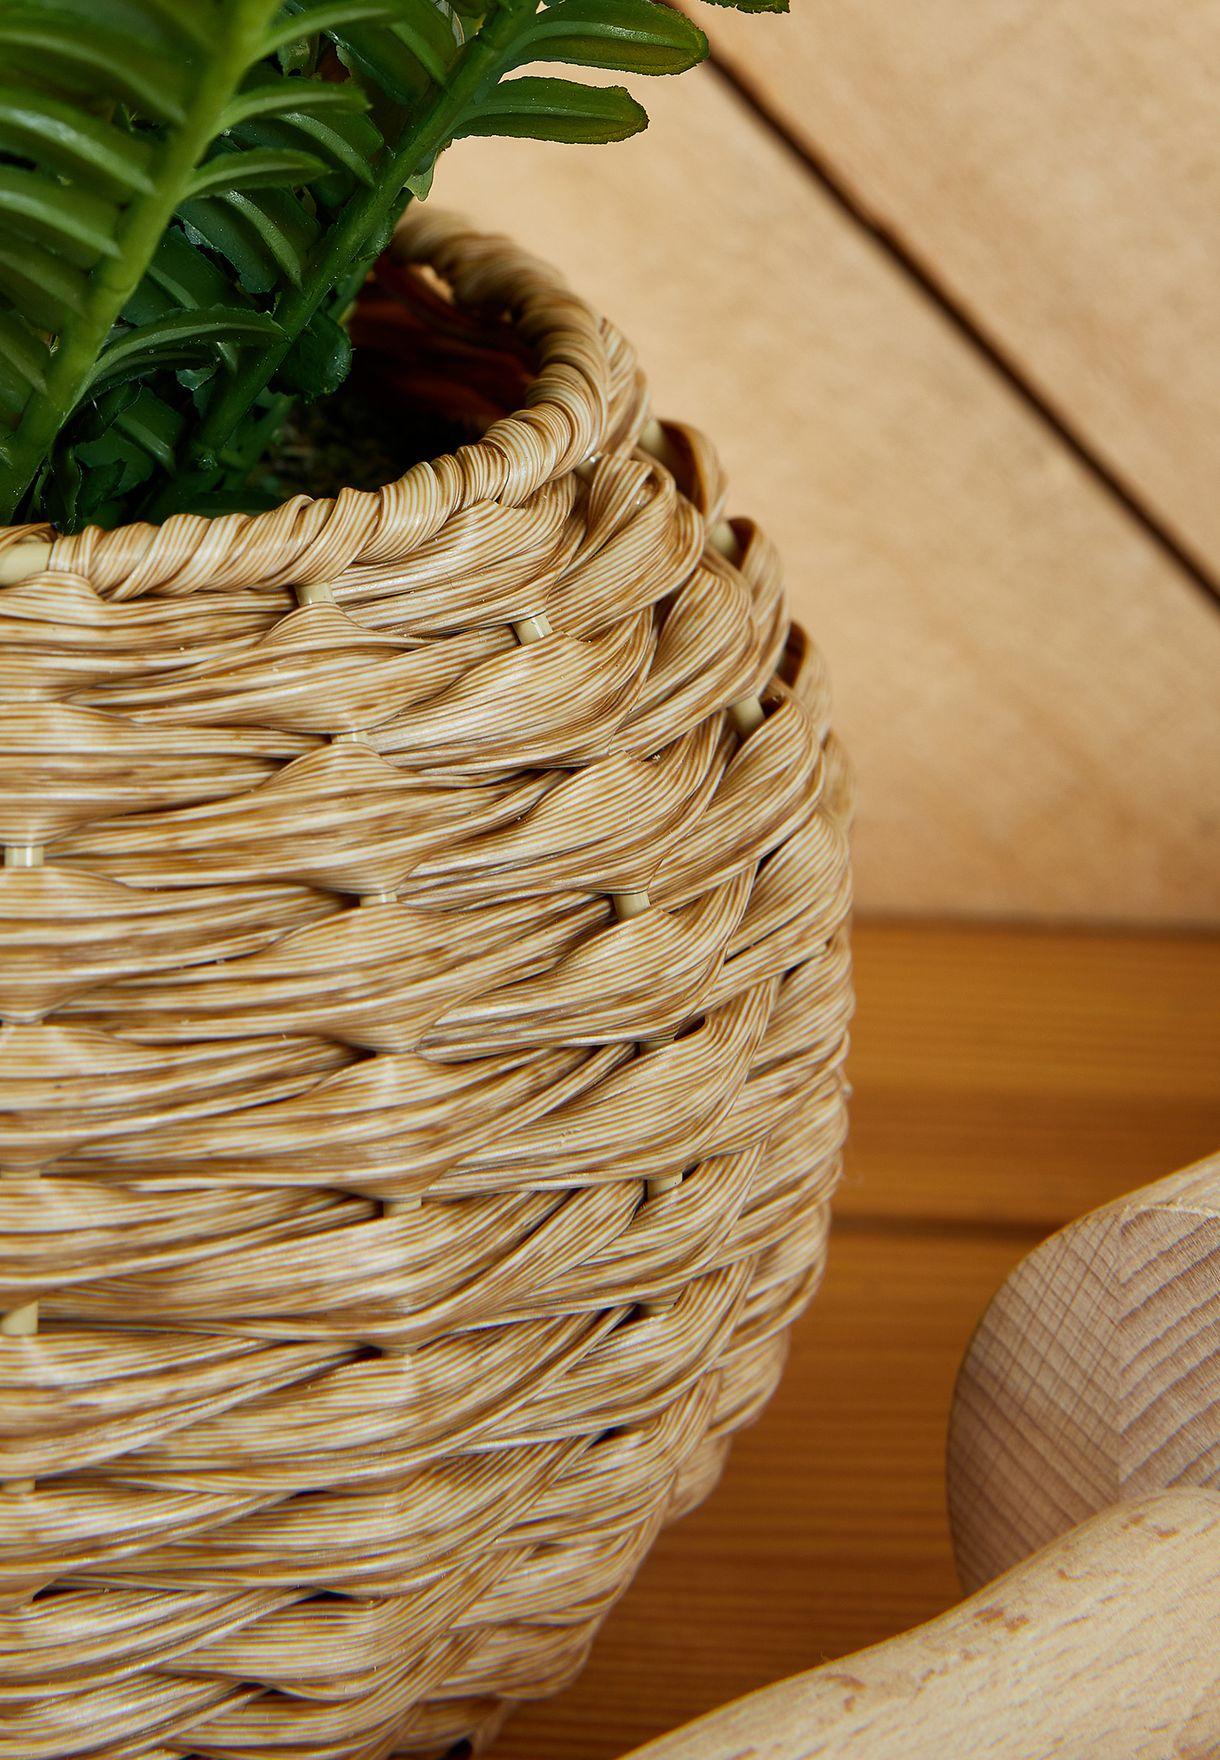 وعاء نبات سرخس صناعي